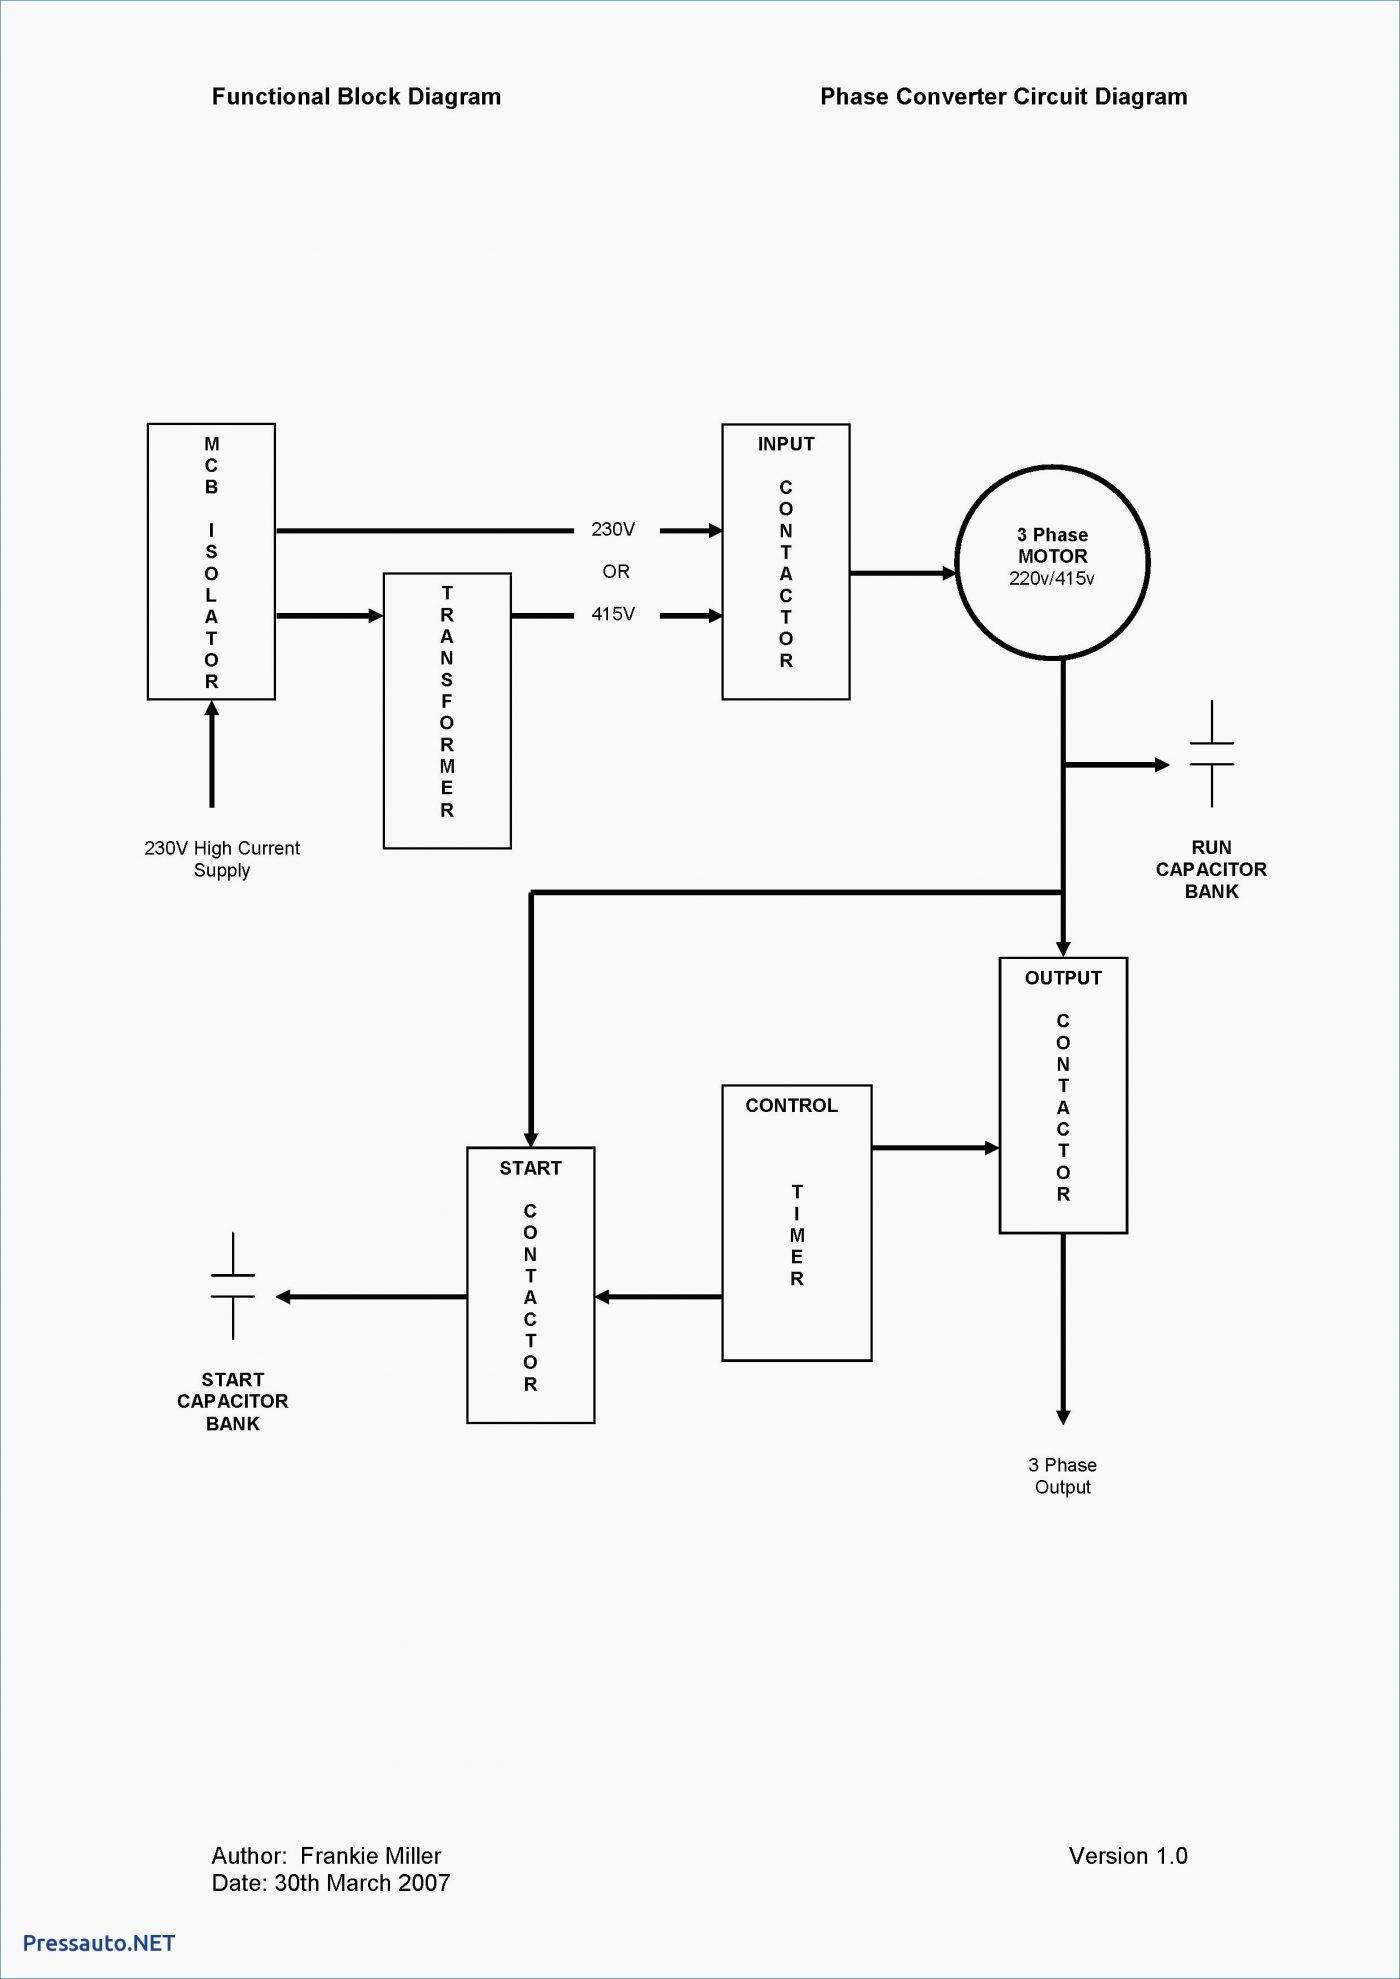 230V Single Phase Wiring Diagram   Wiring Diagram - Wiring Diagram For 230V Single Phase Motor